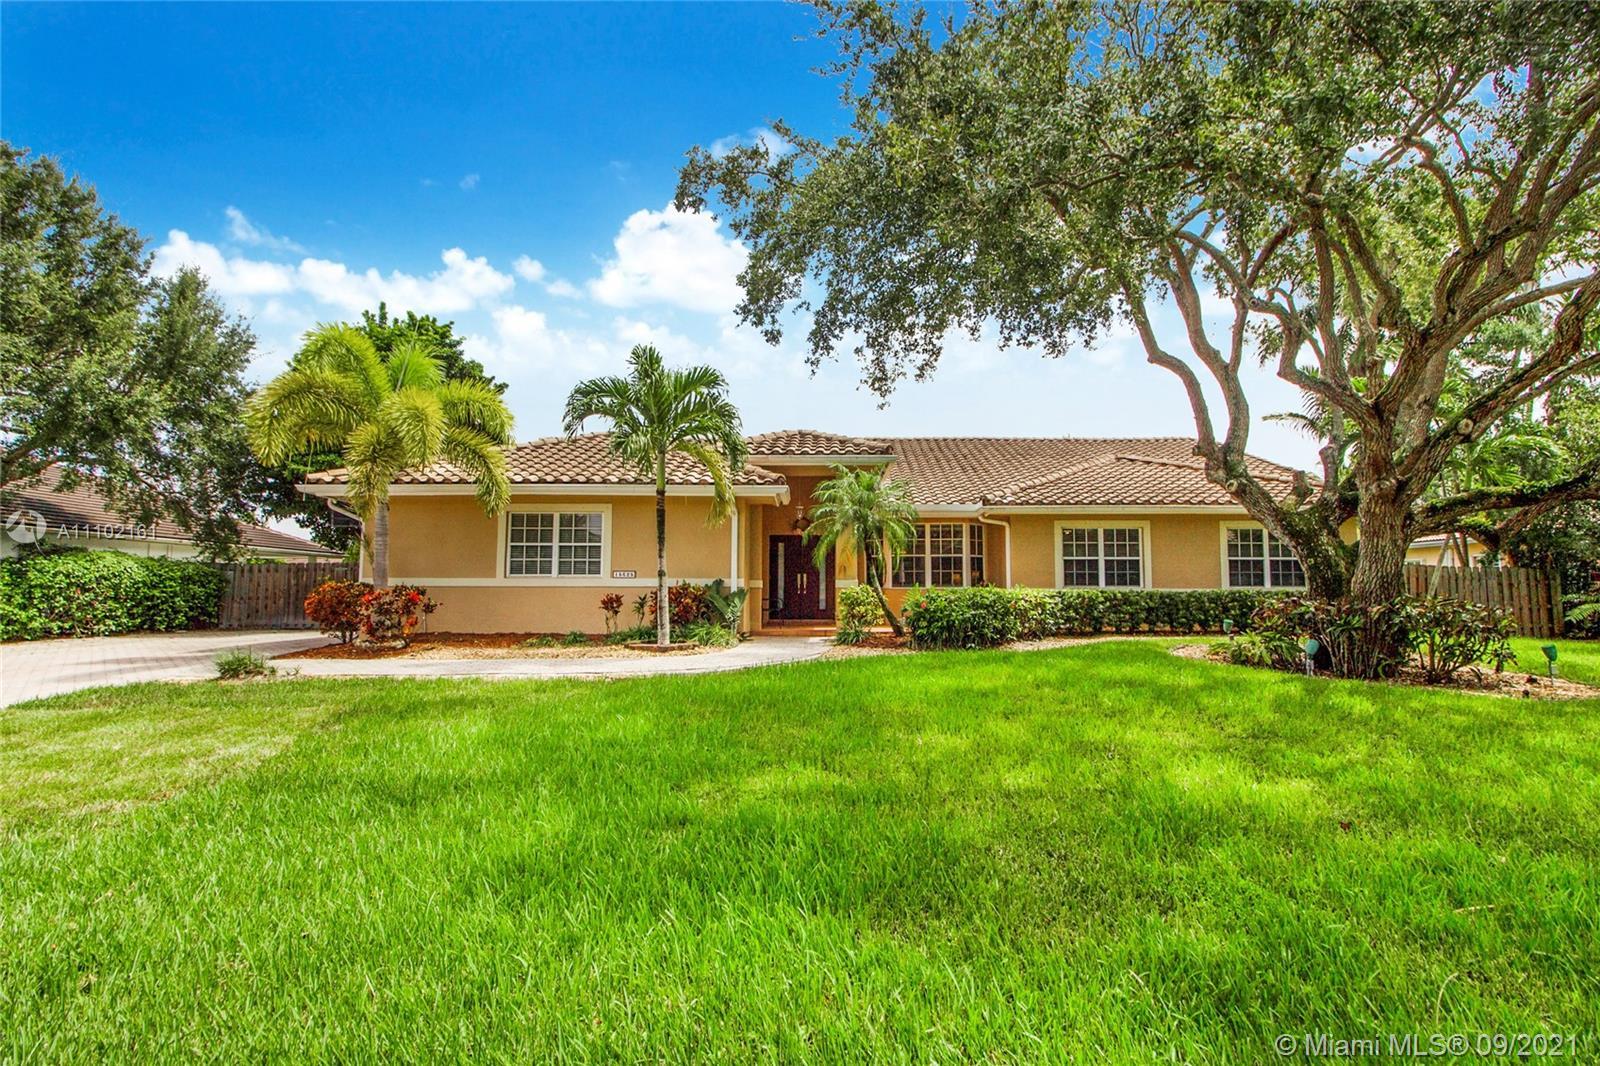 Single Family Home,For Sale,15625 SW 78th Pl, Palmetto Bay, Florida 33157,Brickell,realty,broker,condos near me